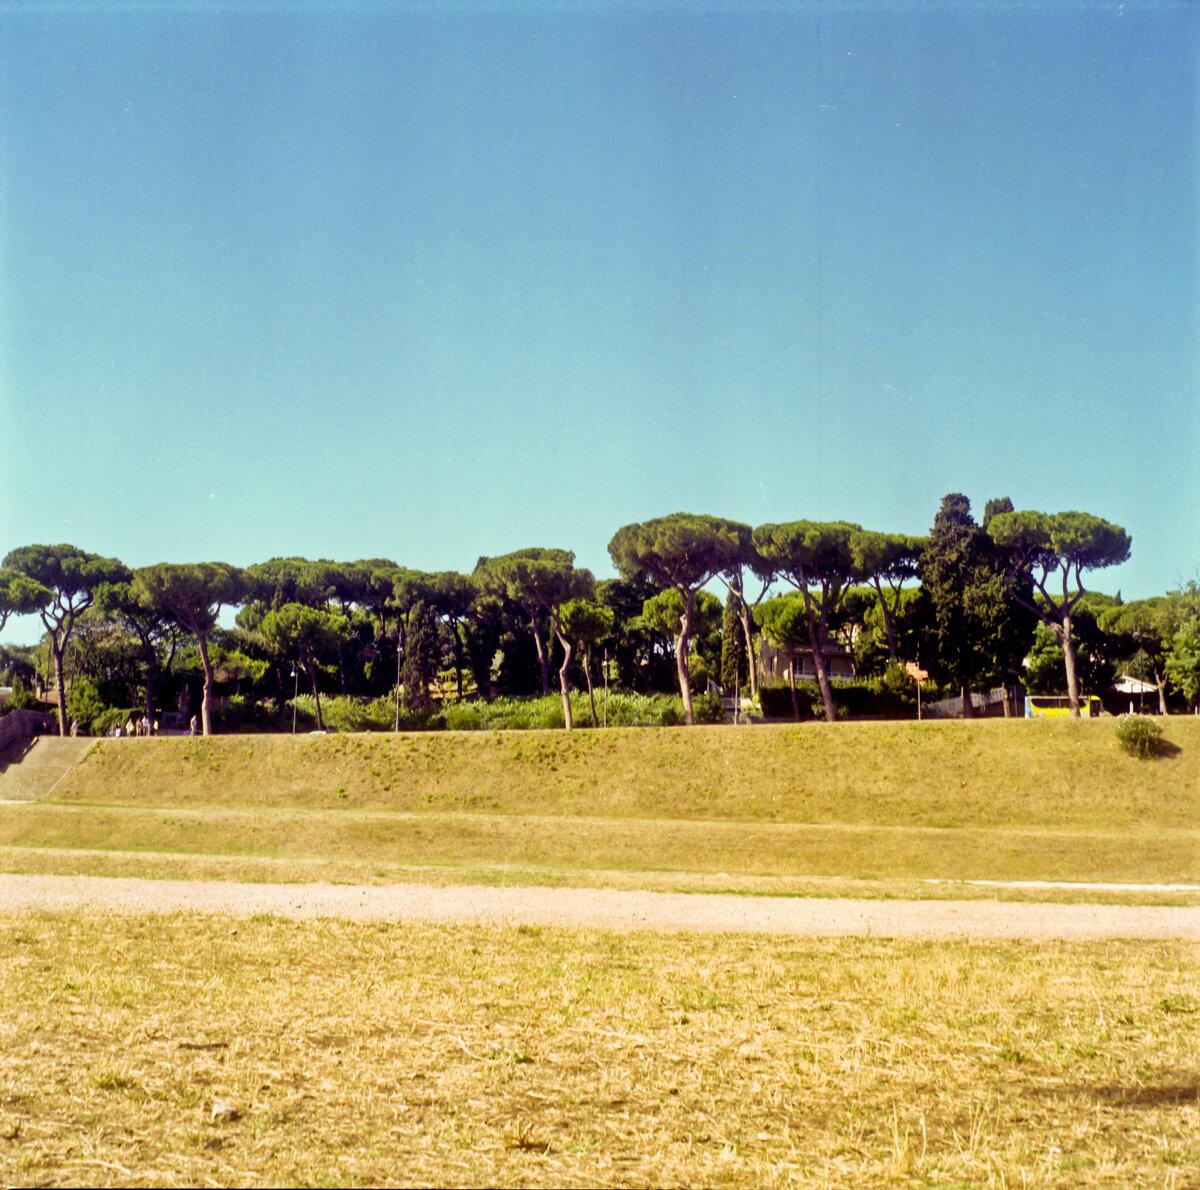 Trees in Rome, Italy - Emma Sywyj.jpg